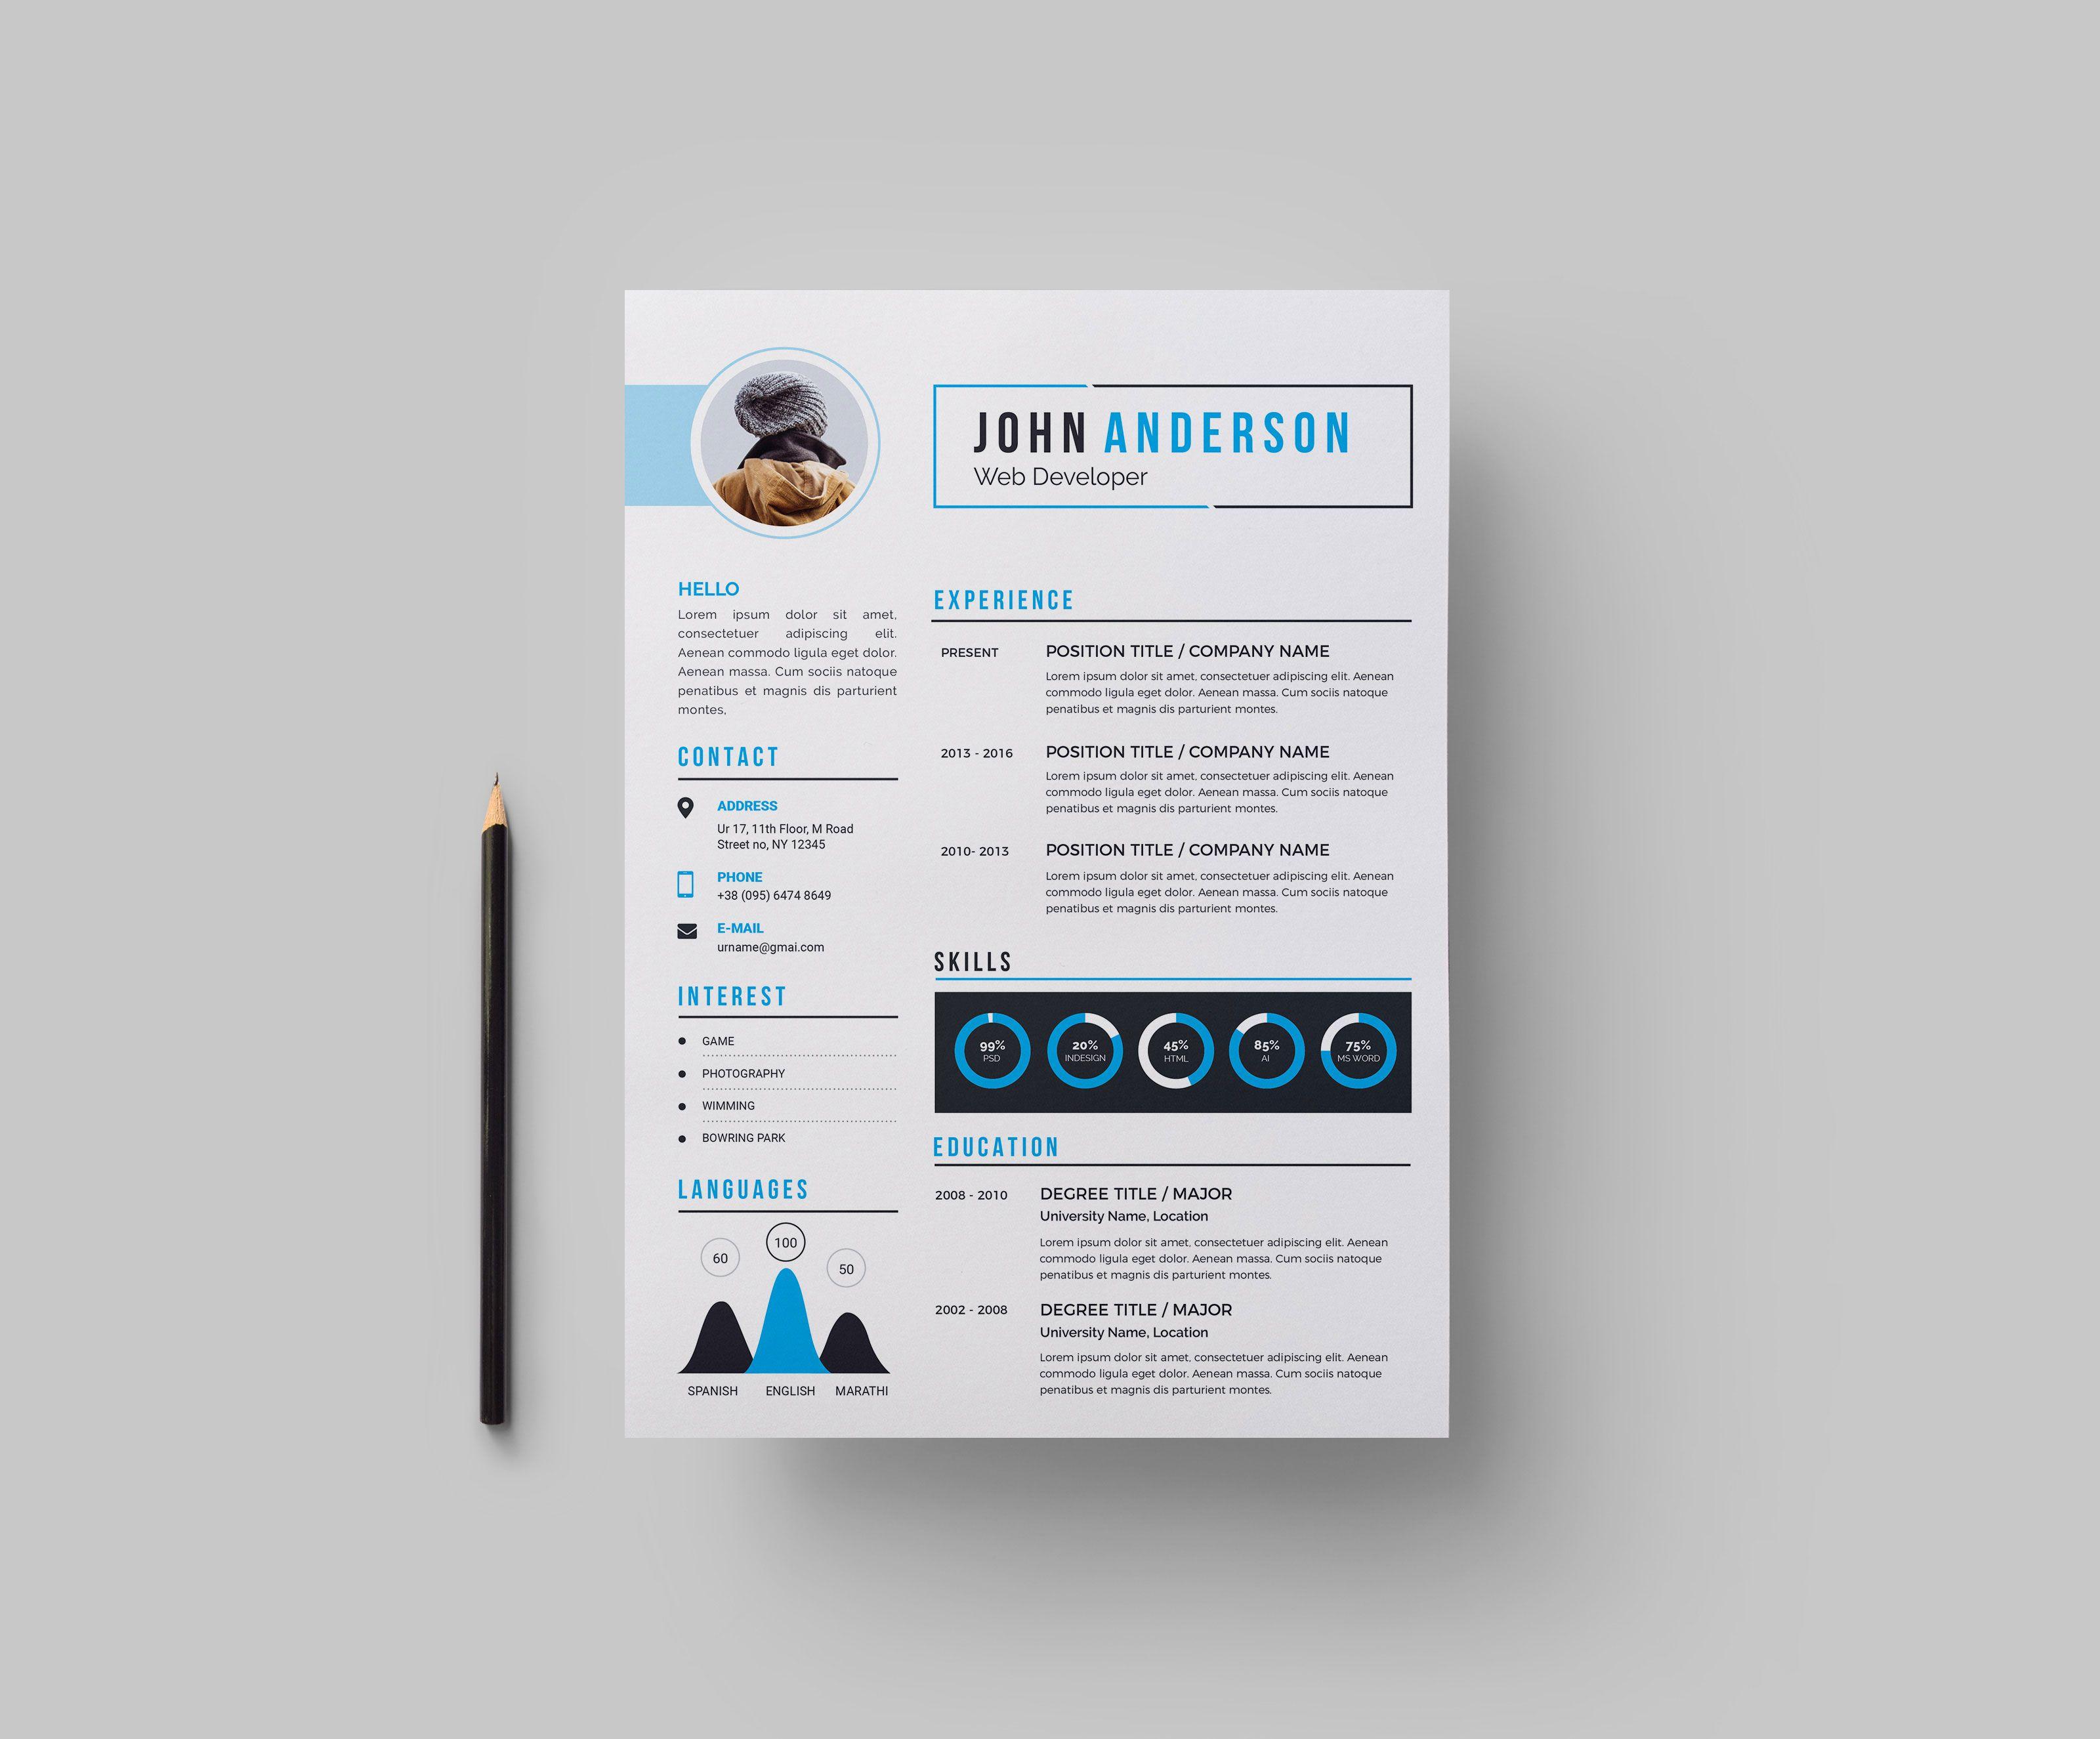 Stylish Cv Design Template Graphic Templates Cv Design Template Cv Design Resume Design Template